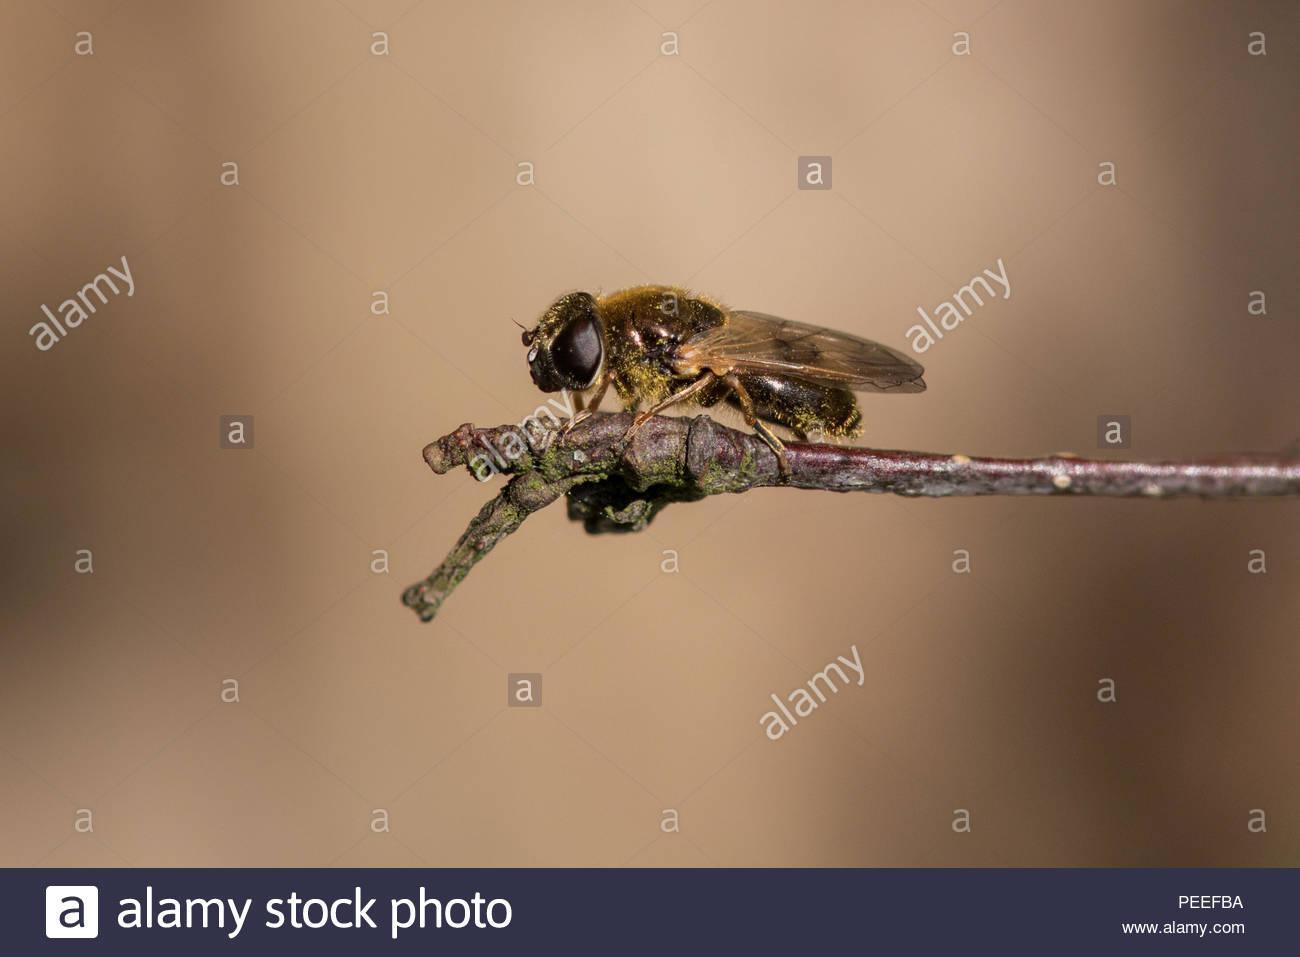 Hoverfly Cheilosia urbana - Stock Image